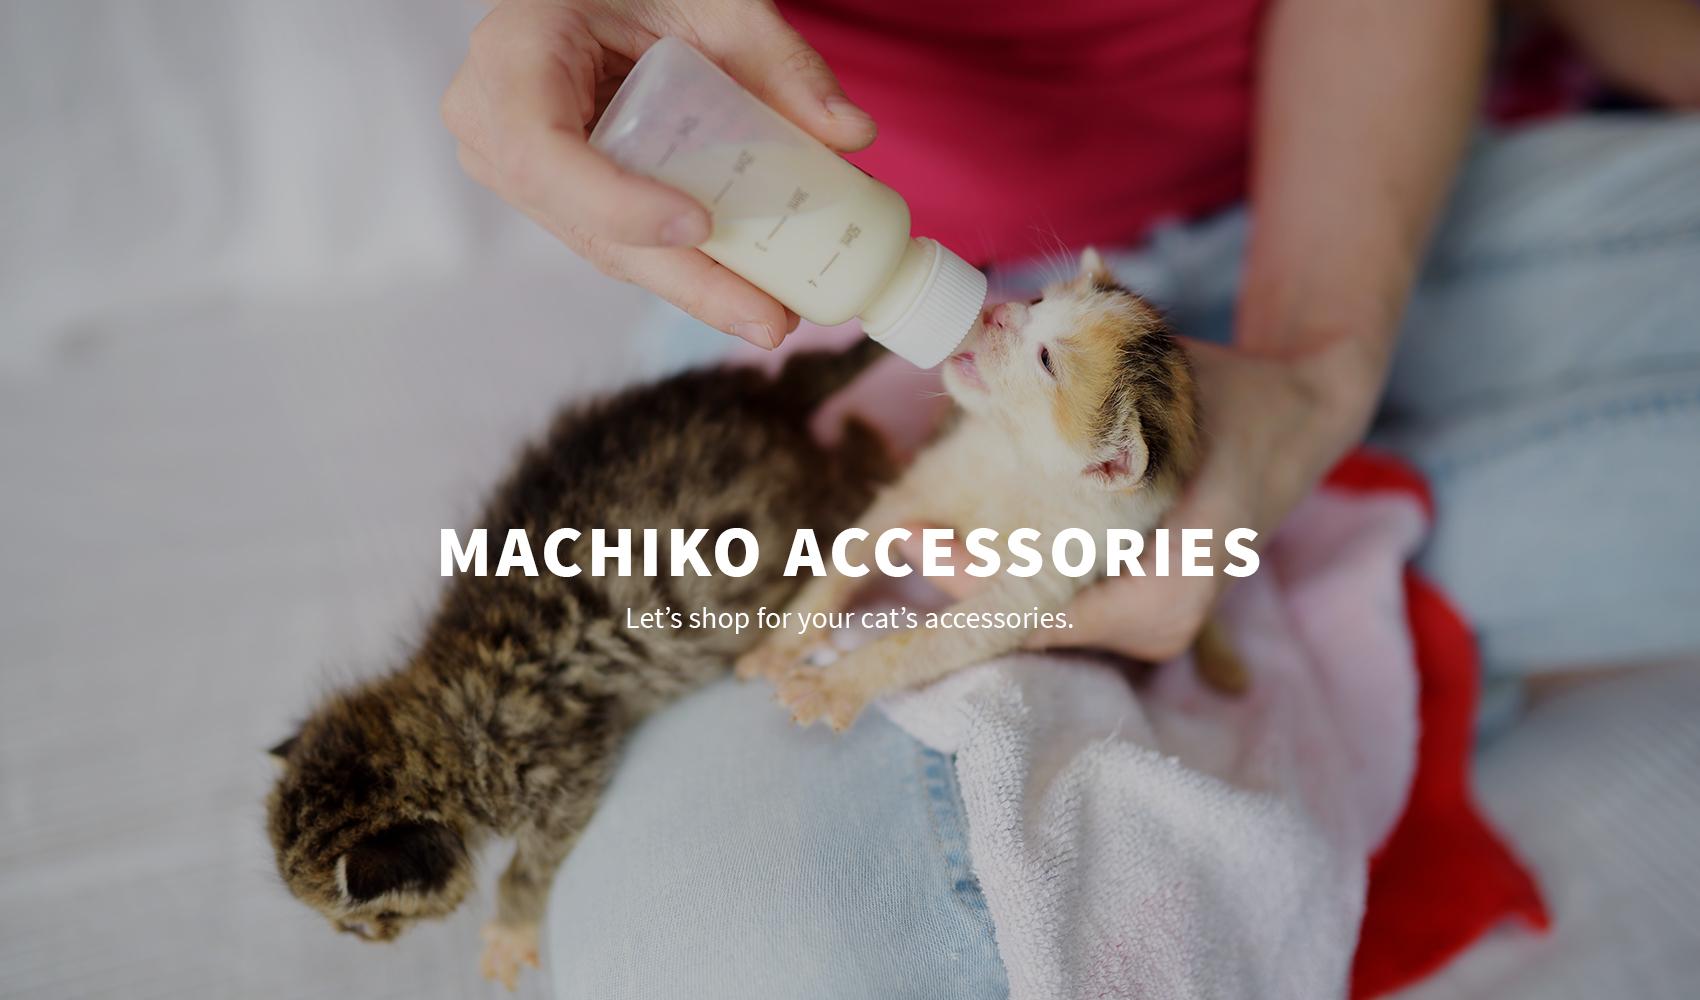 Machiko Accessories